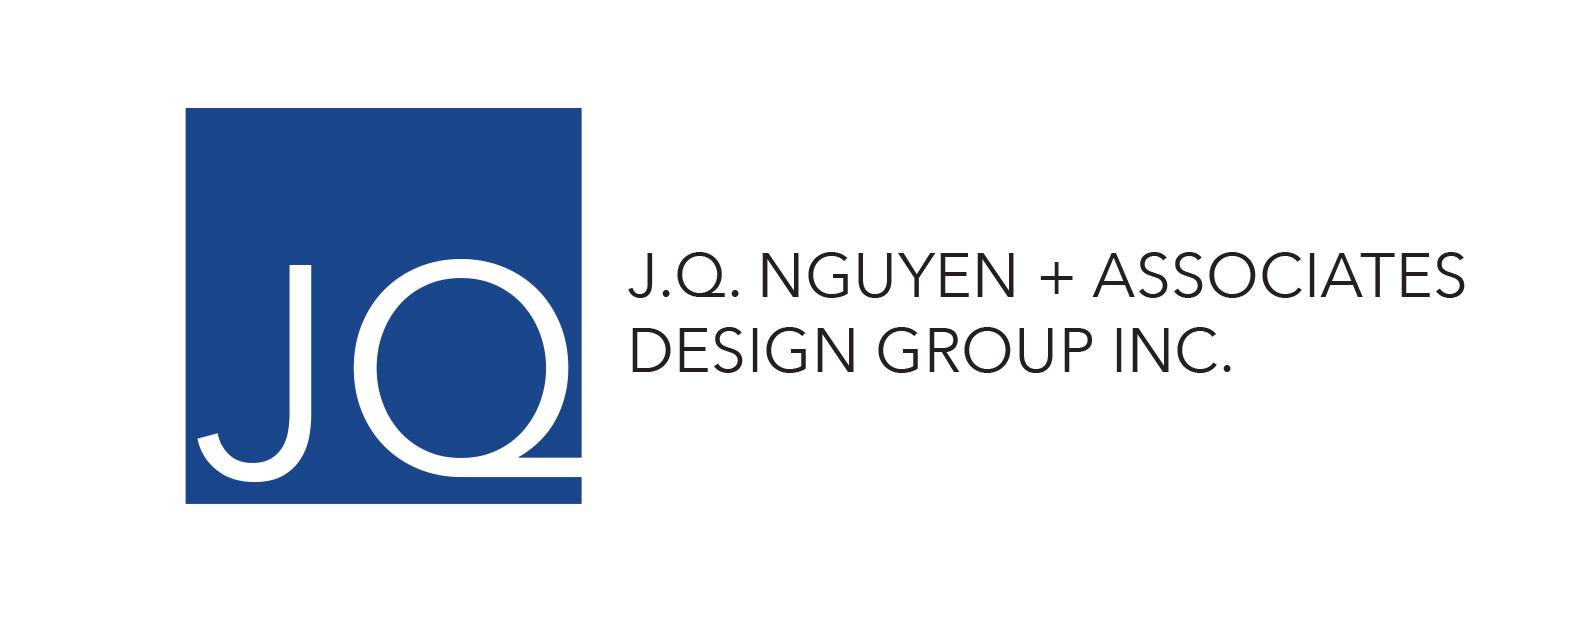 J.Q. Nguyen + Associates Design Group Inc.